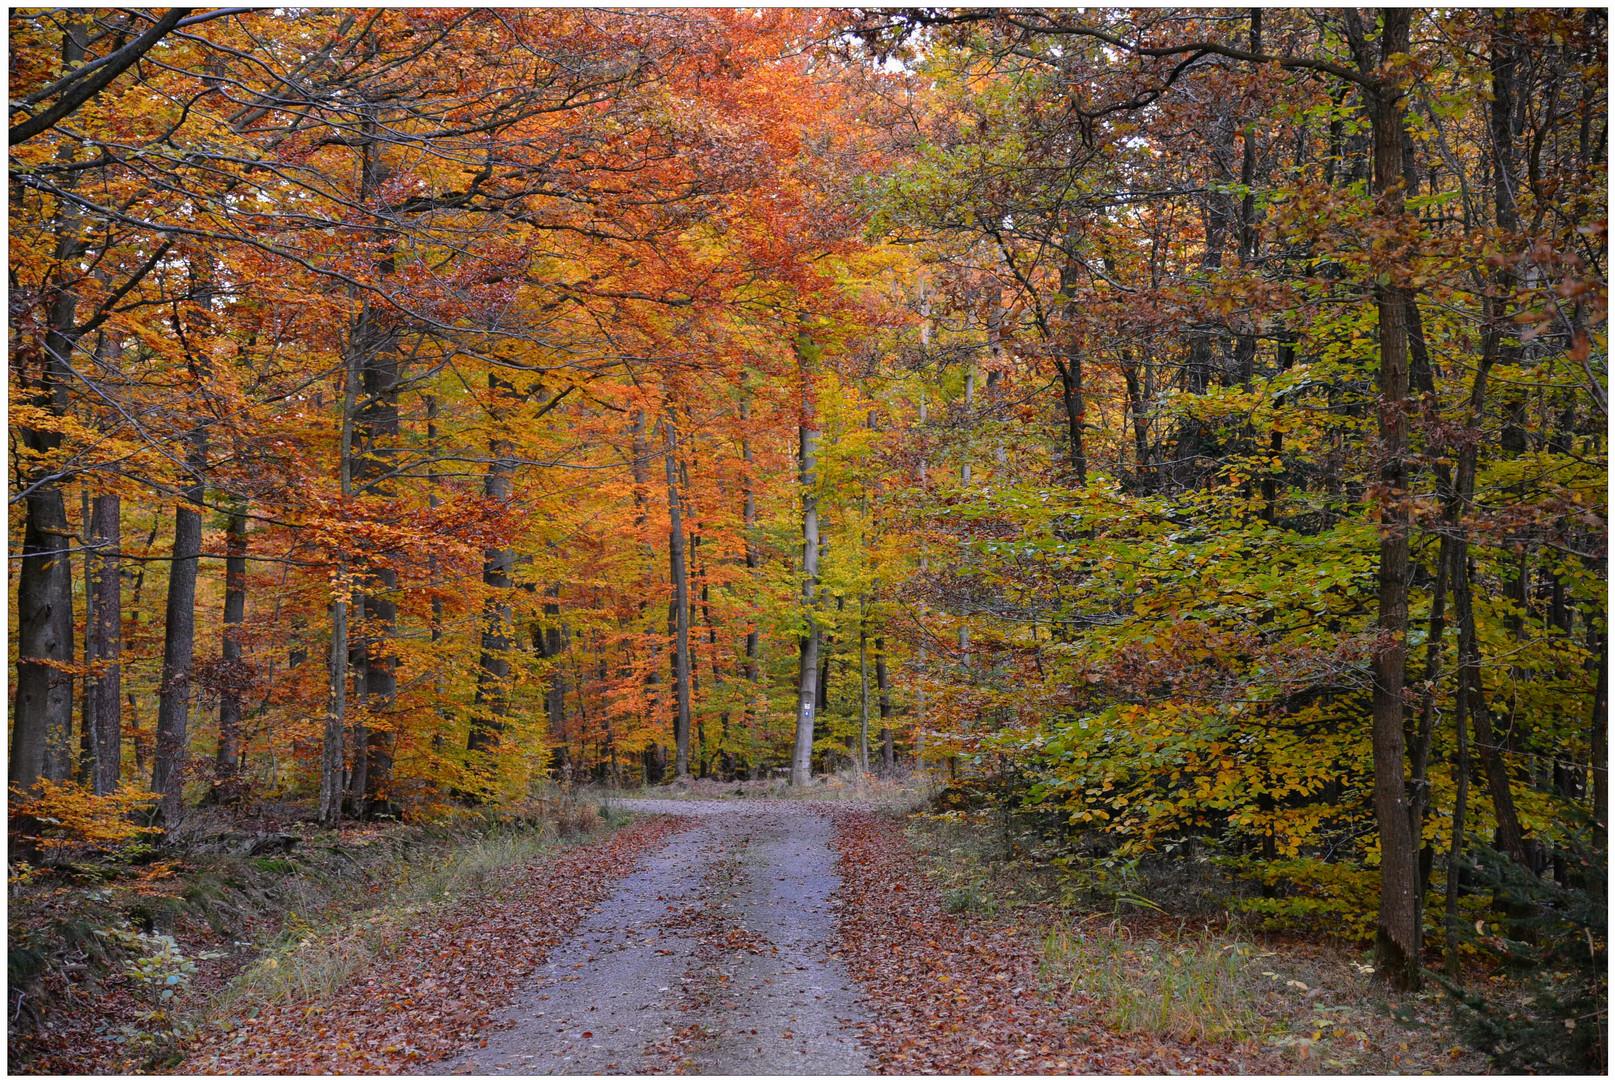 Camino por el bosque otoñal (Weg durch den herbstlichen Wald)